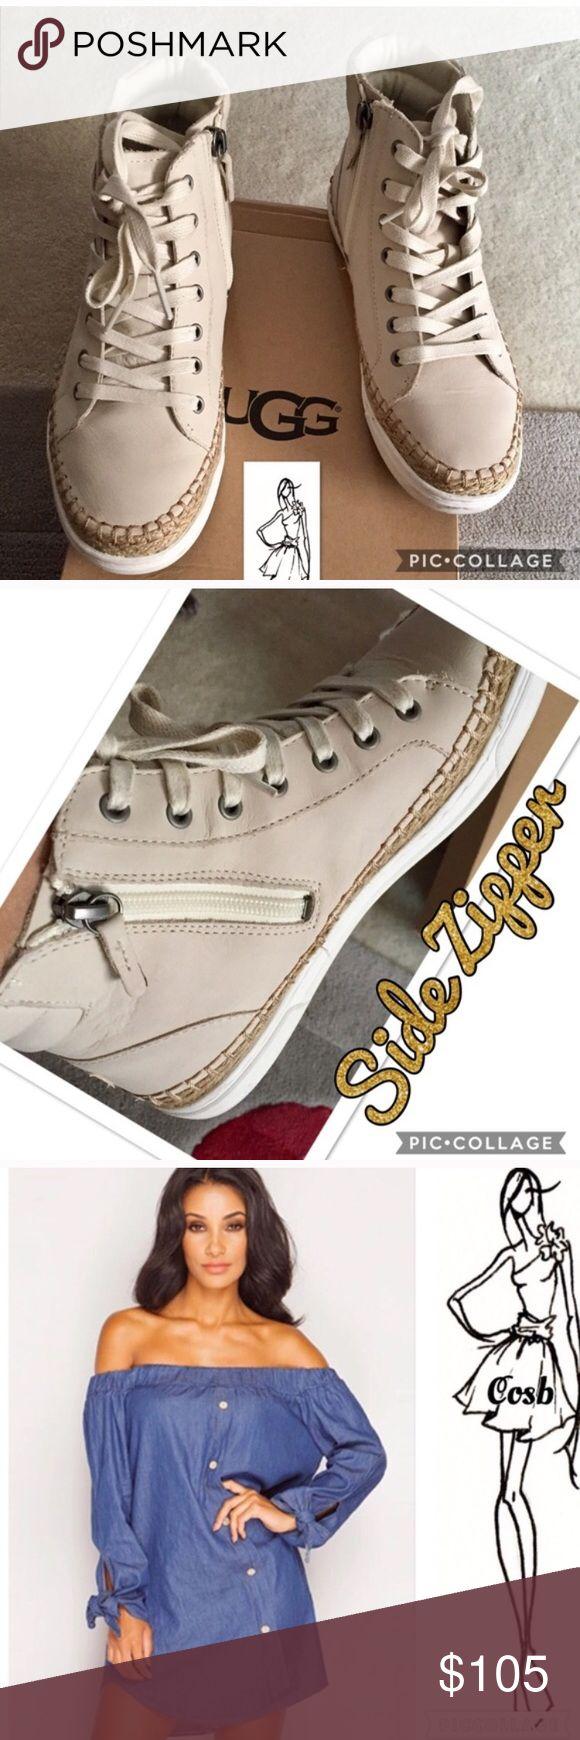 Bundle of Ugg Sneakers & Denim Top Ugg Wheat Color Sneakers & Denim off the shoulders top....See original listing for full description Other